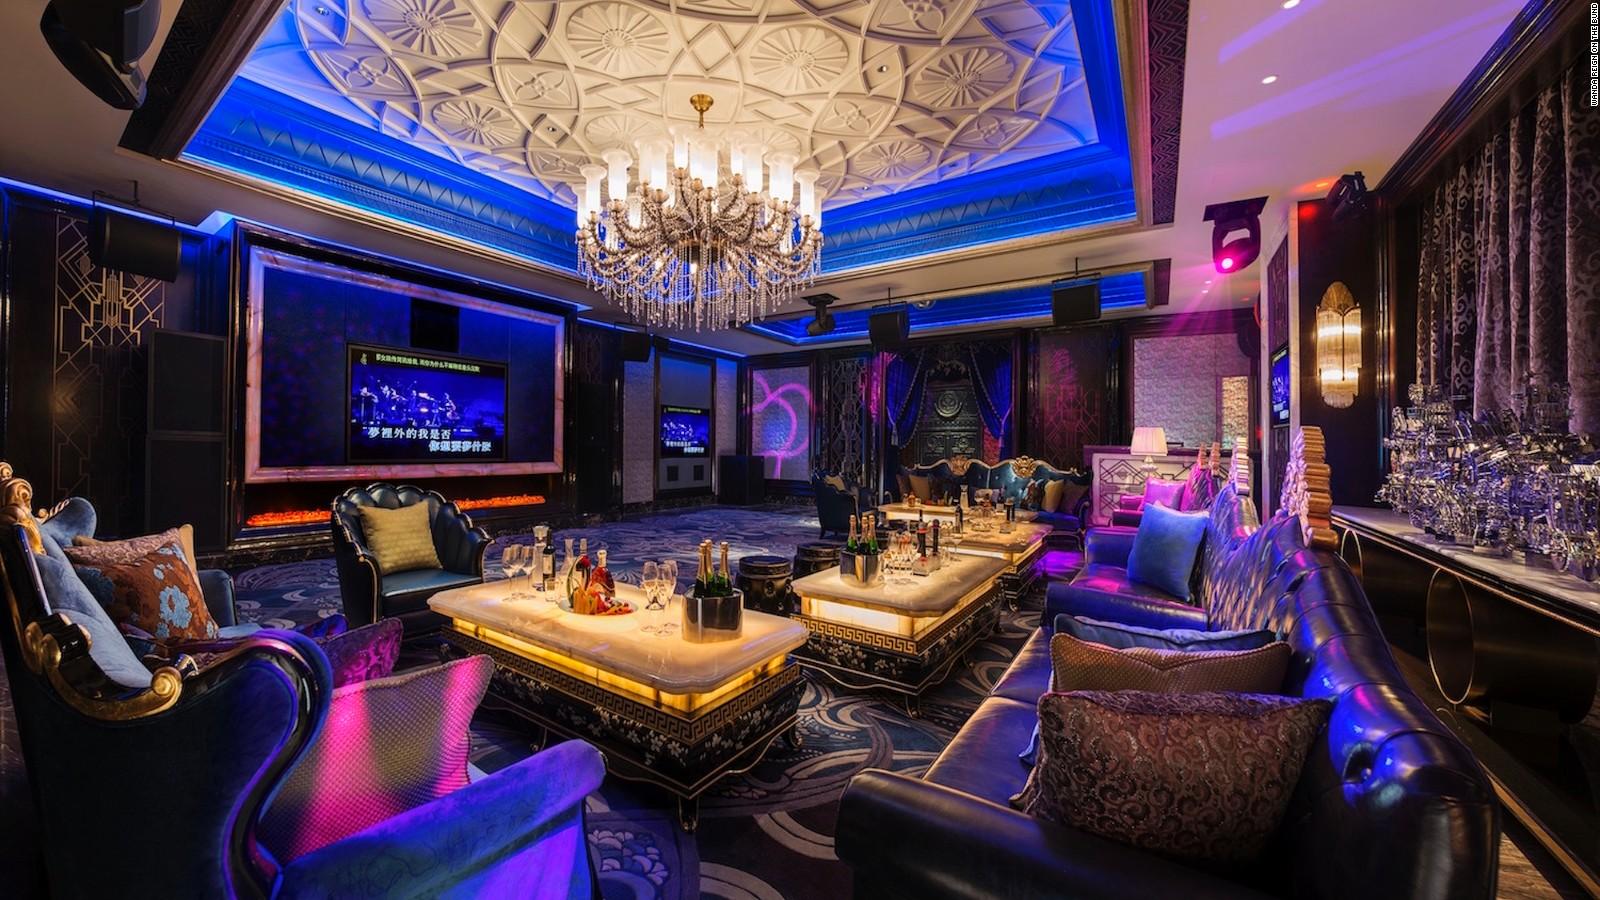 Wanda Reign On The Bund Seven Star Hotel In Shaghai Cnn Travel